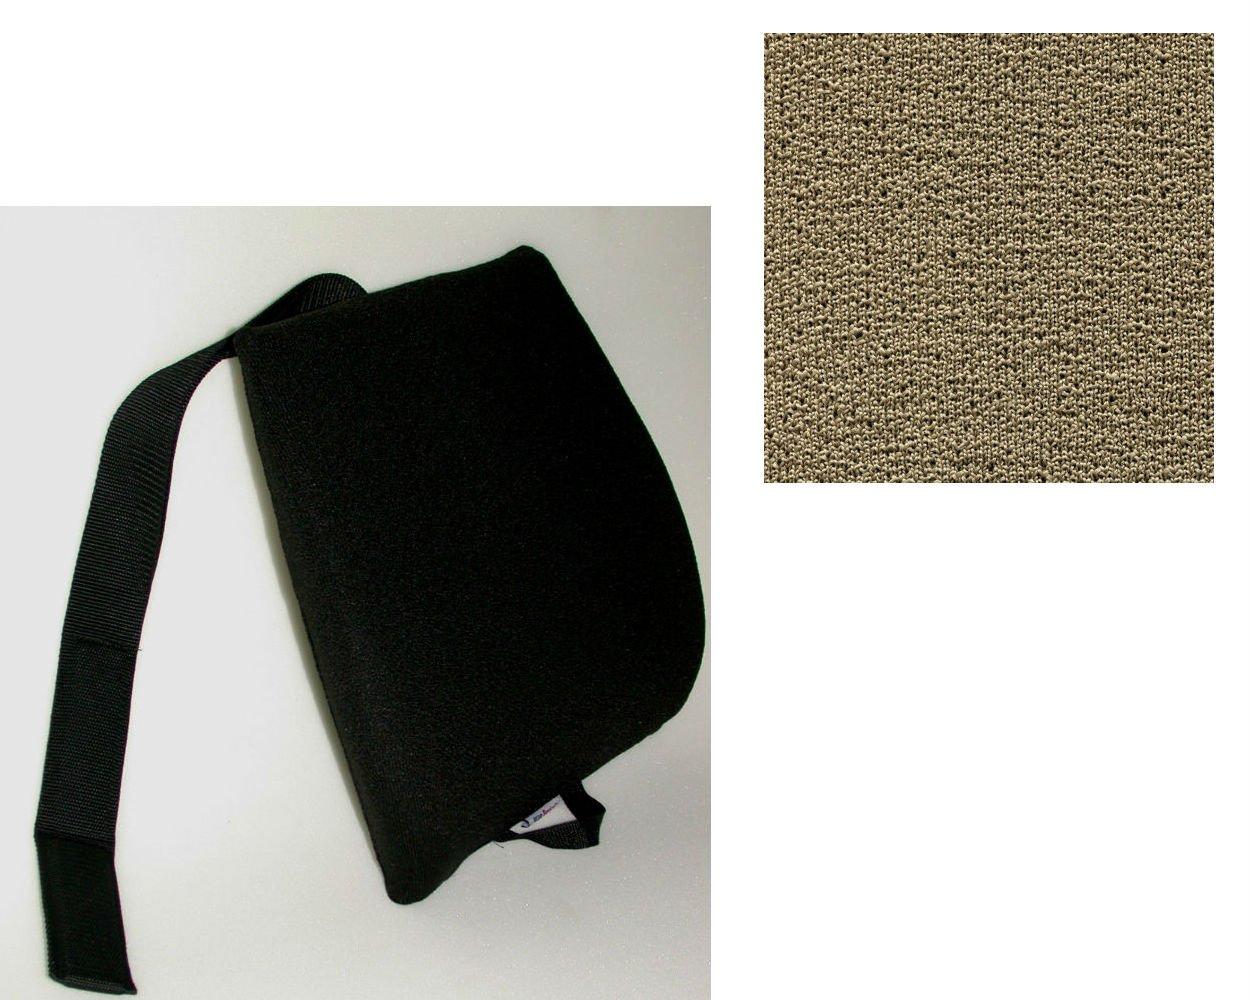 Mc Carty's Sacro-Ease Ergo Curve Cush Lumbar Support Cushion, Cappuccino